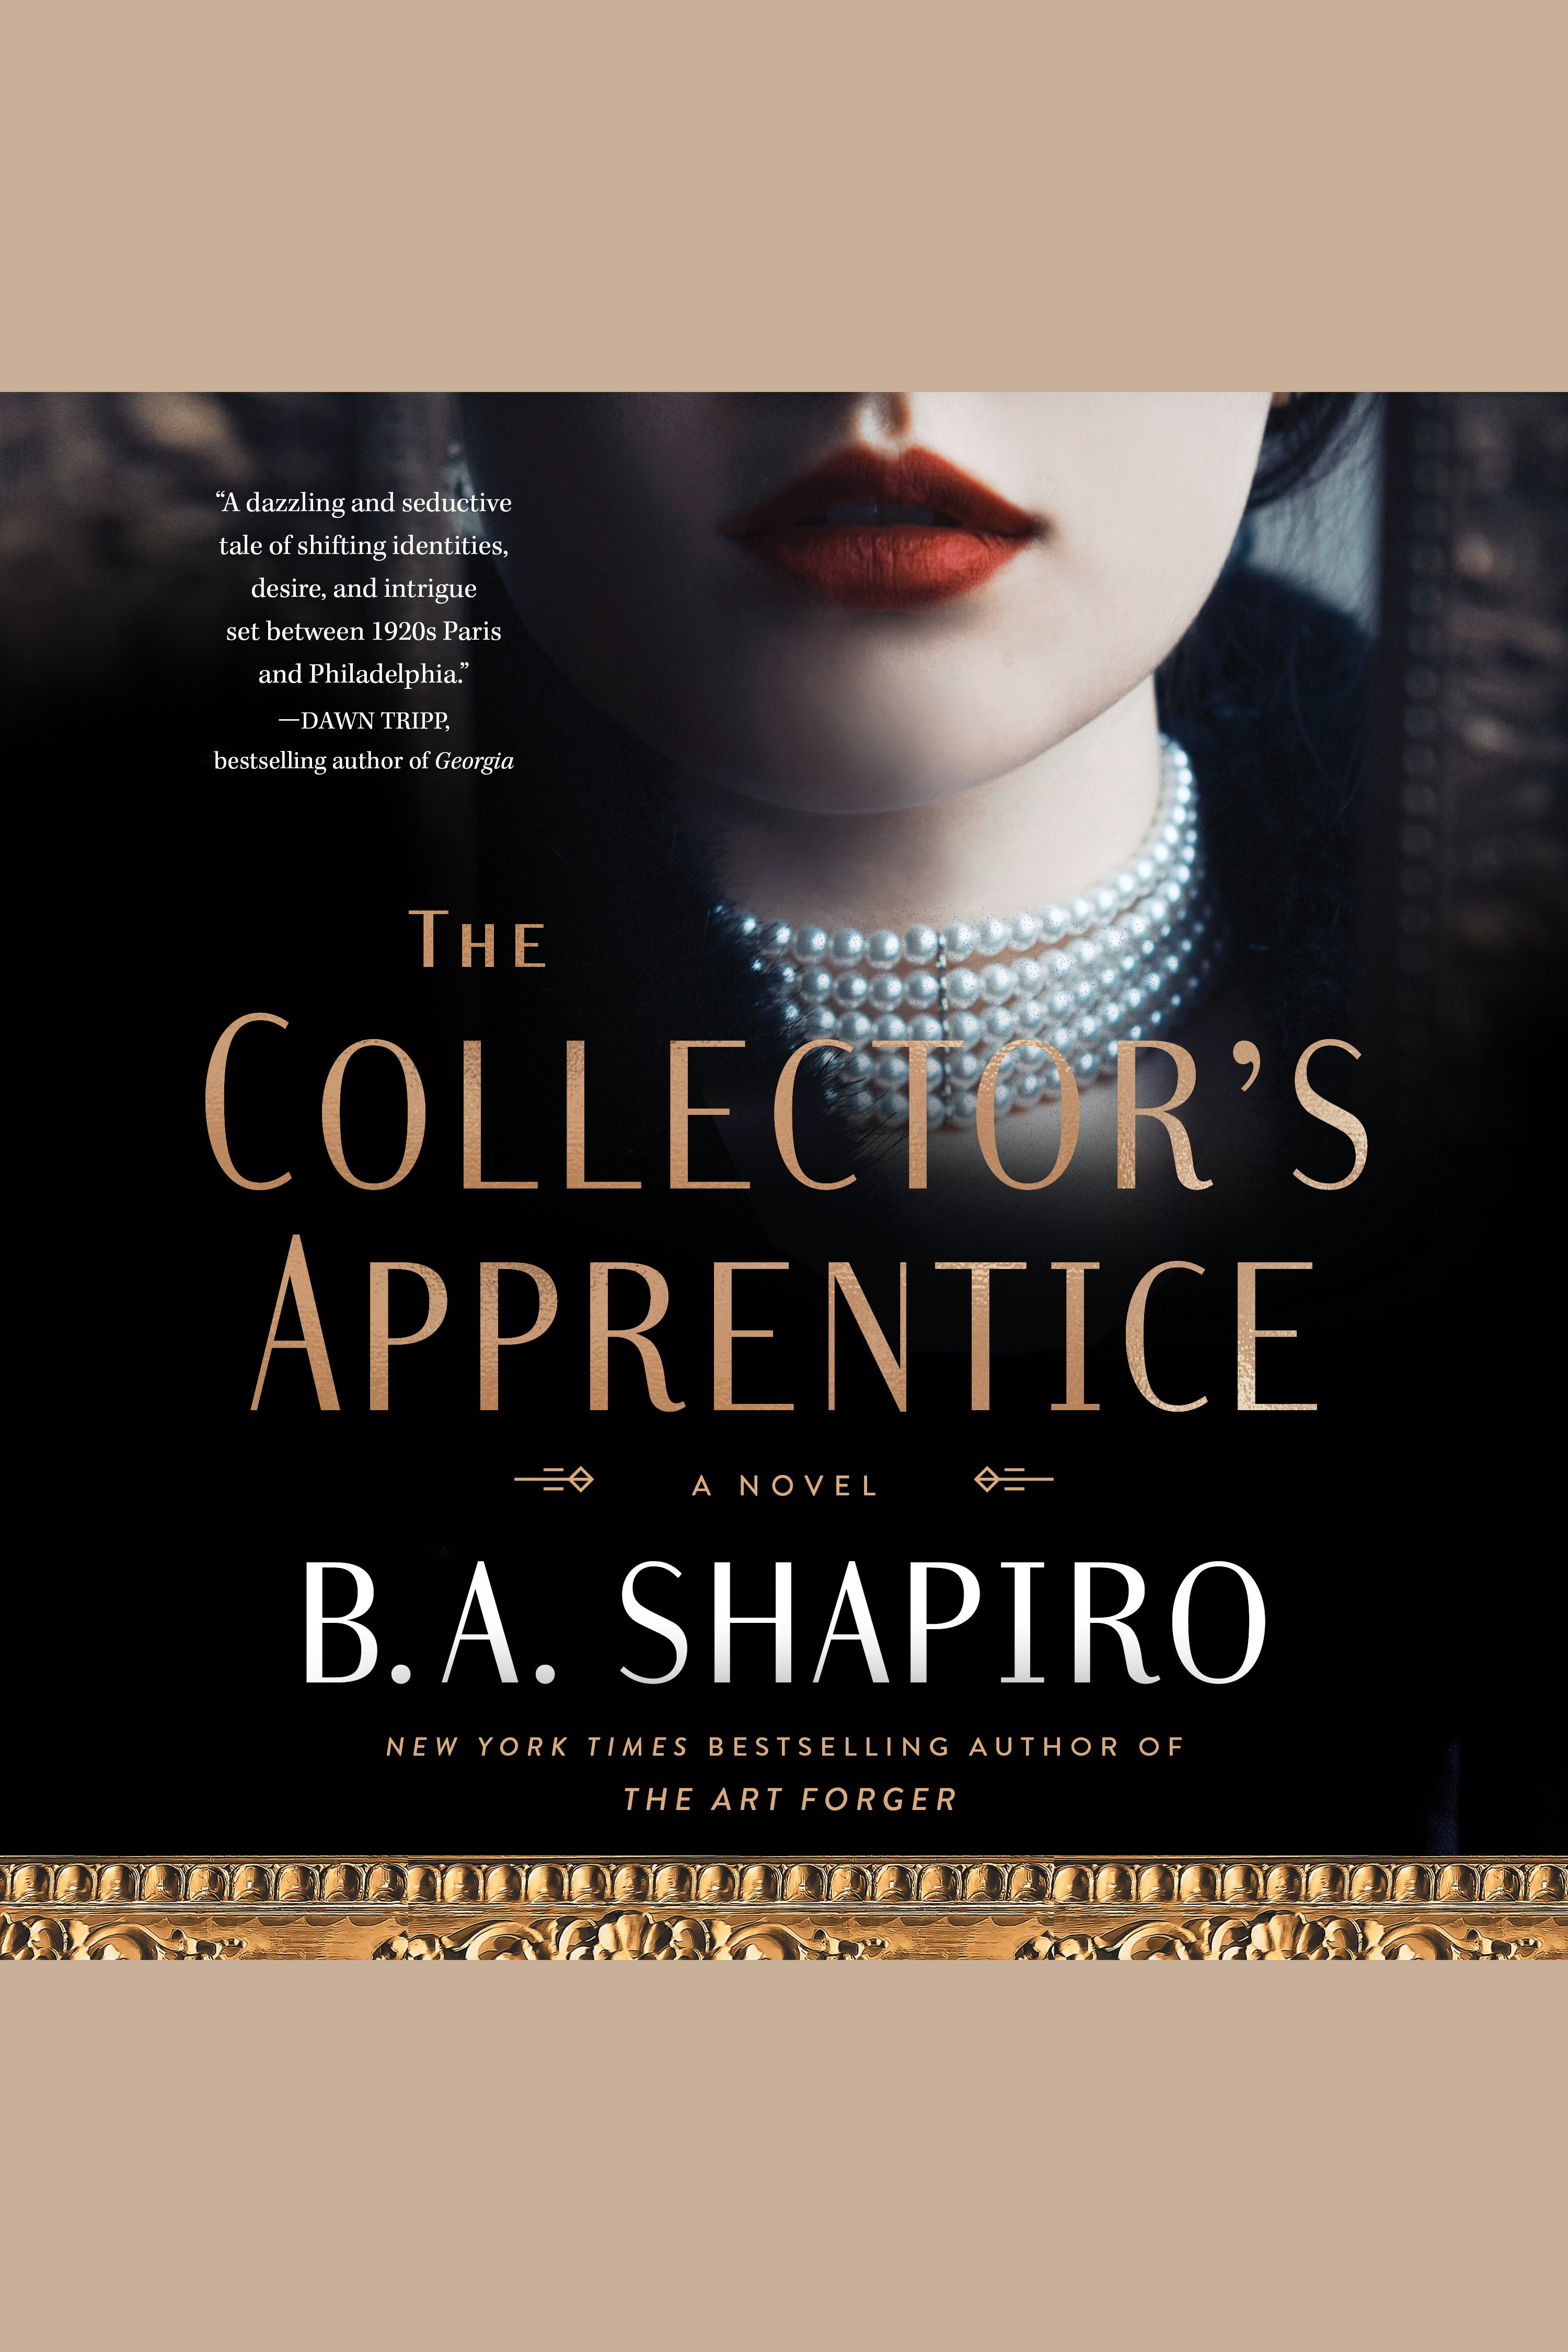 The collector's apprentice a novel